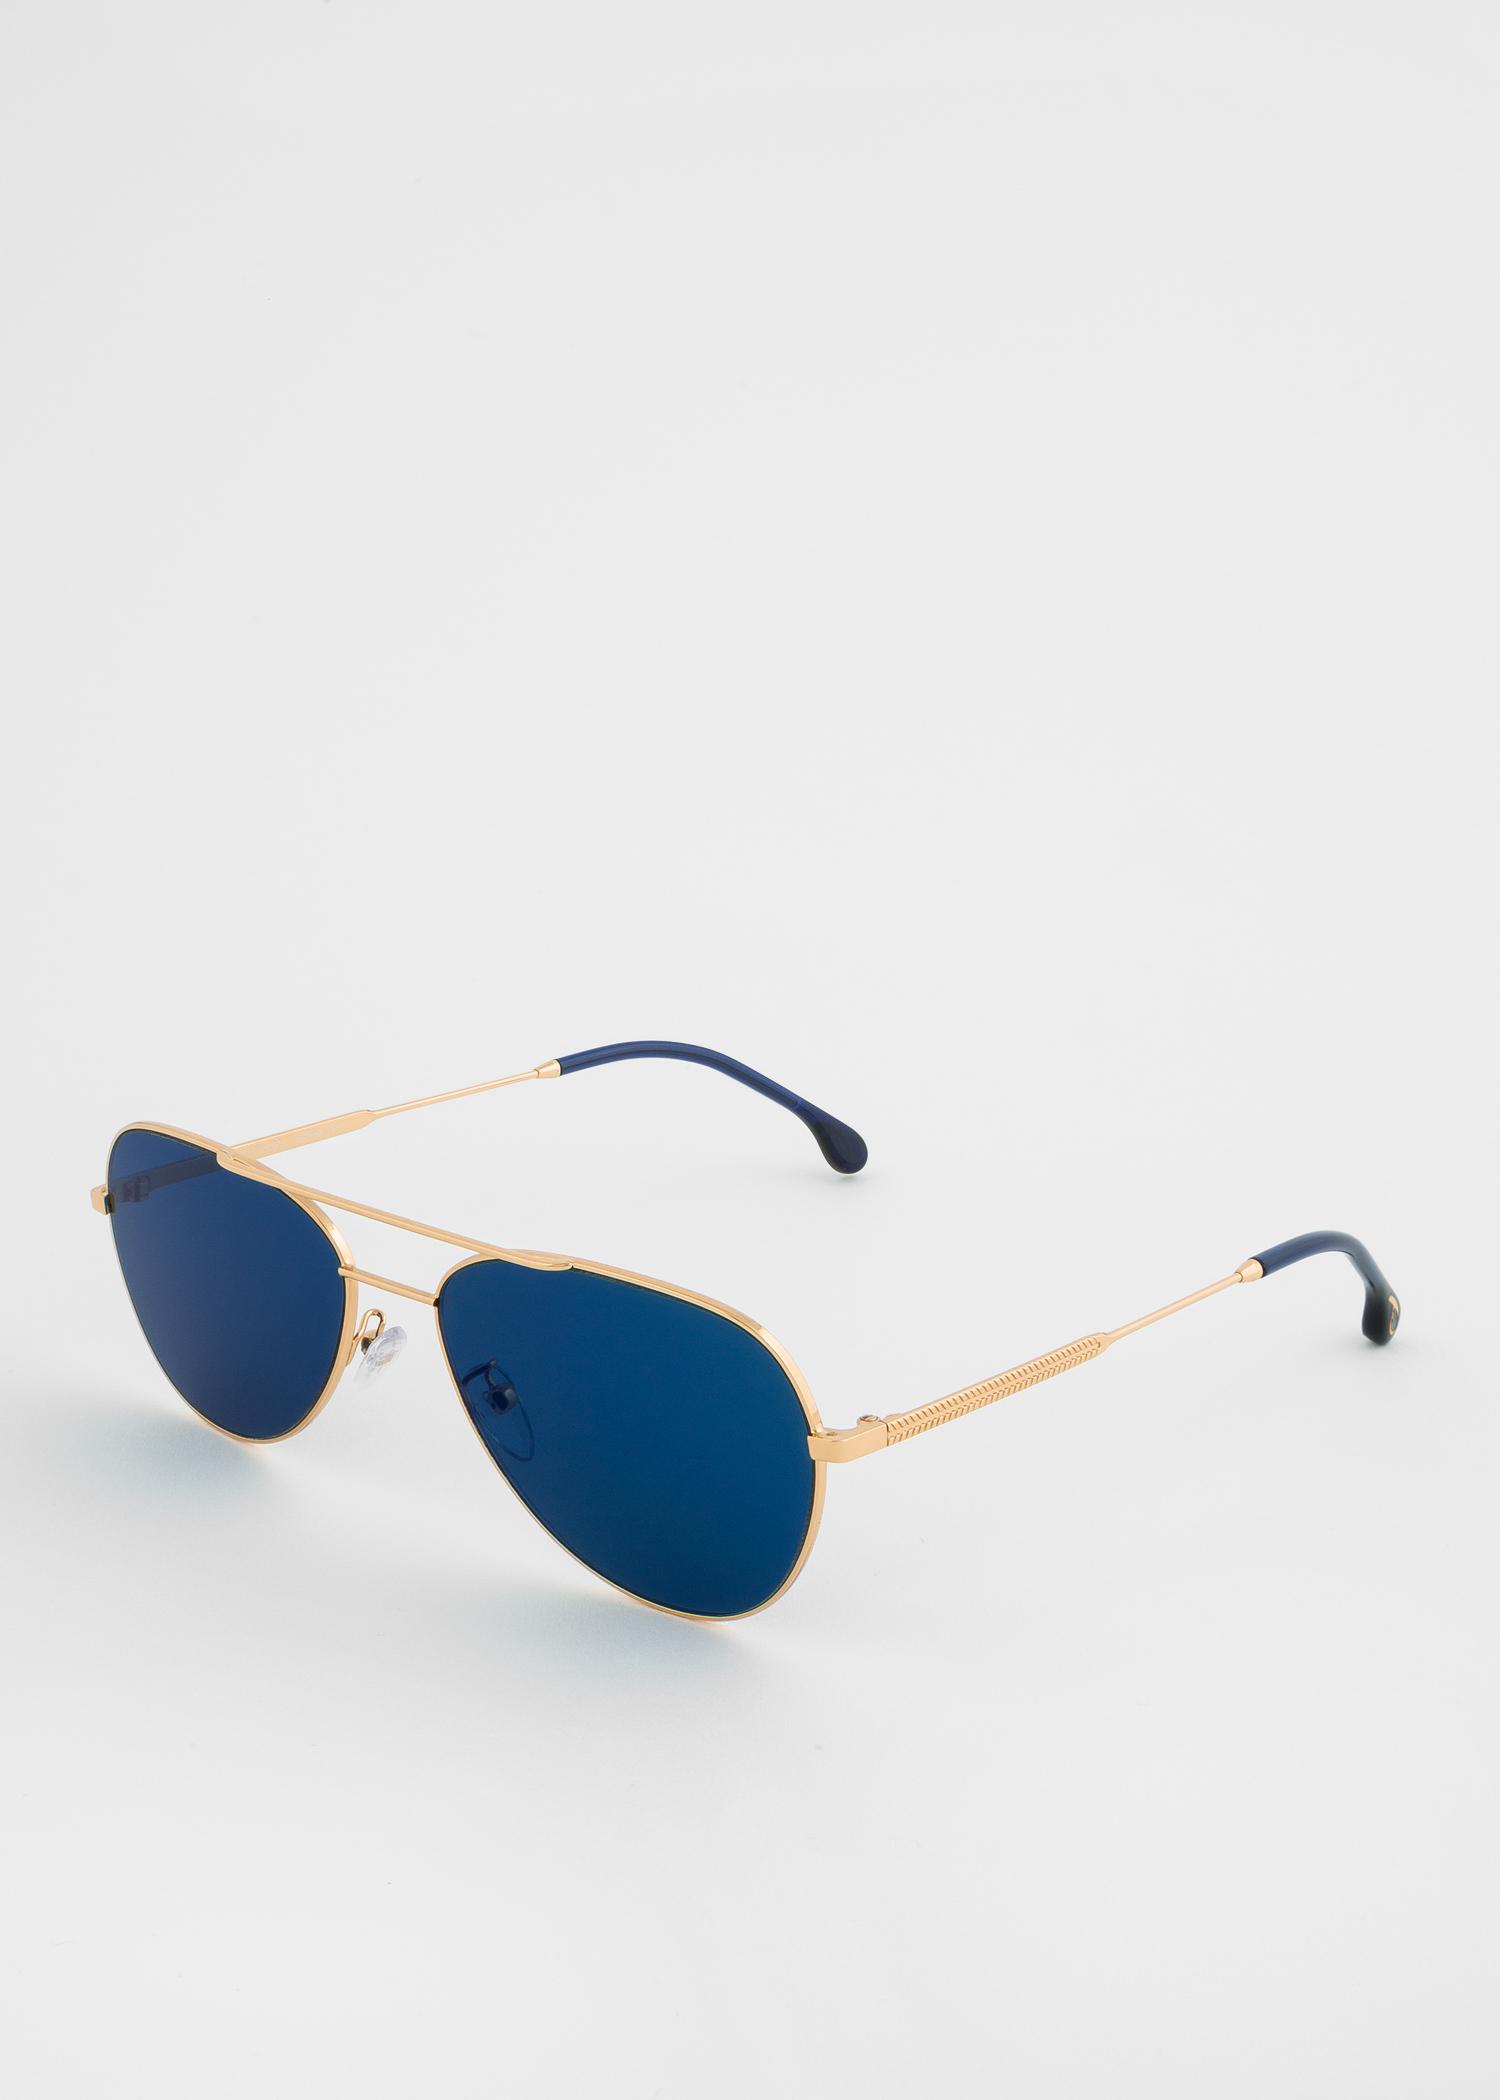 03b7fdcfae Paul Smith Gold And Deep Navy  Angus  Sunglasses - Paul Smith US